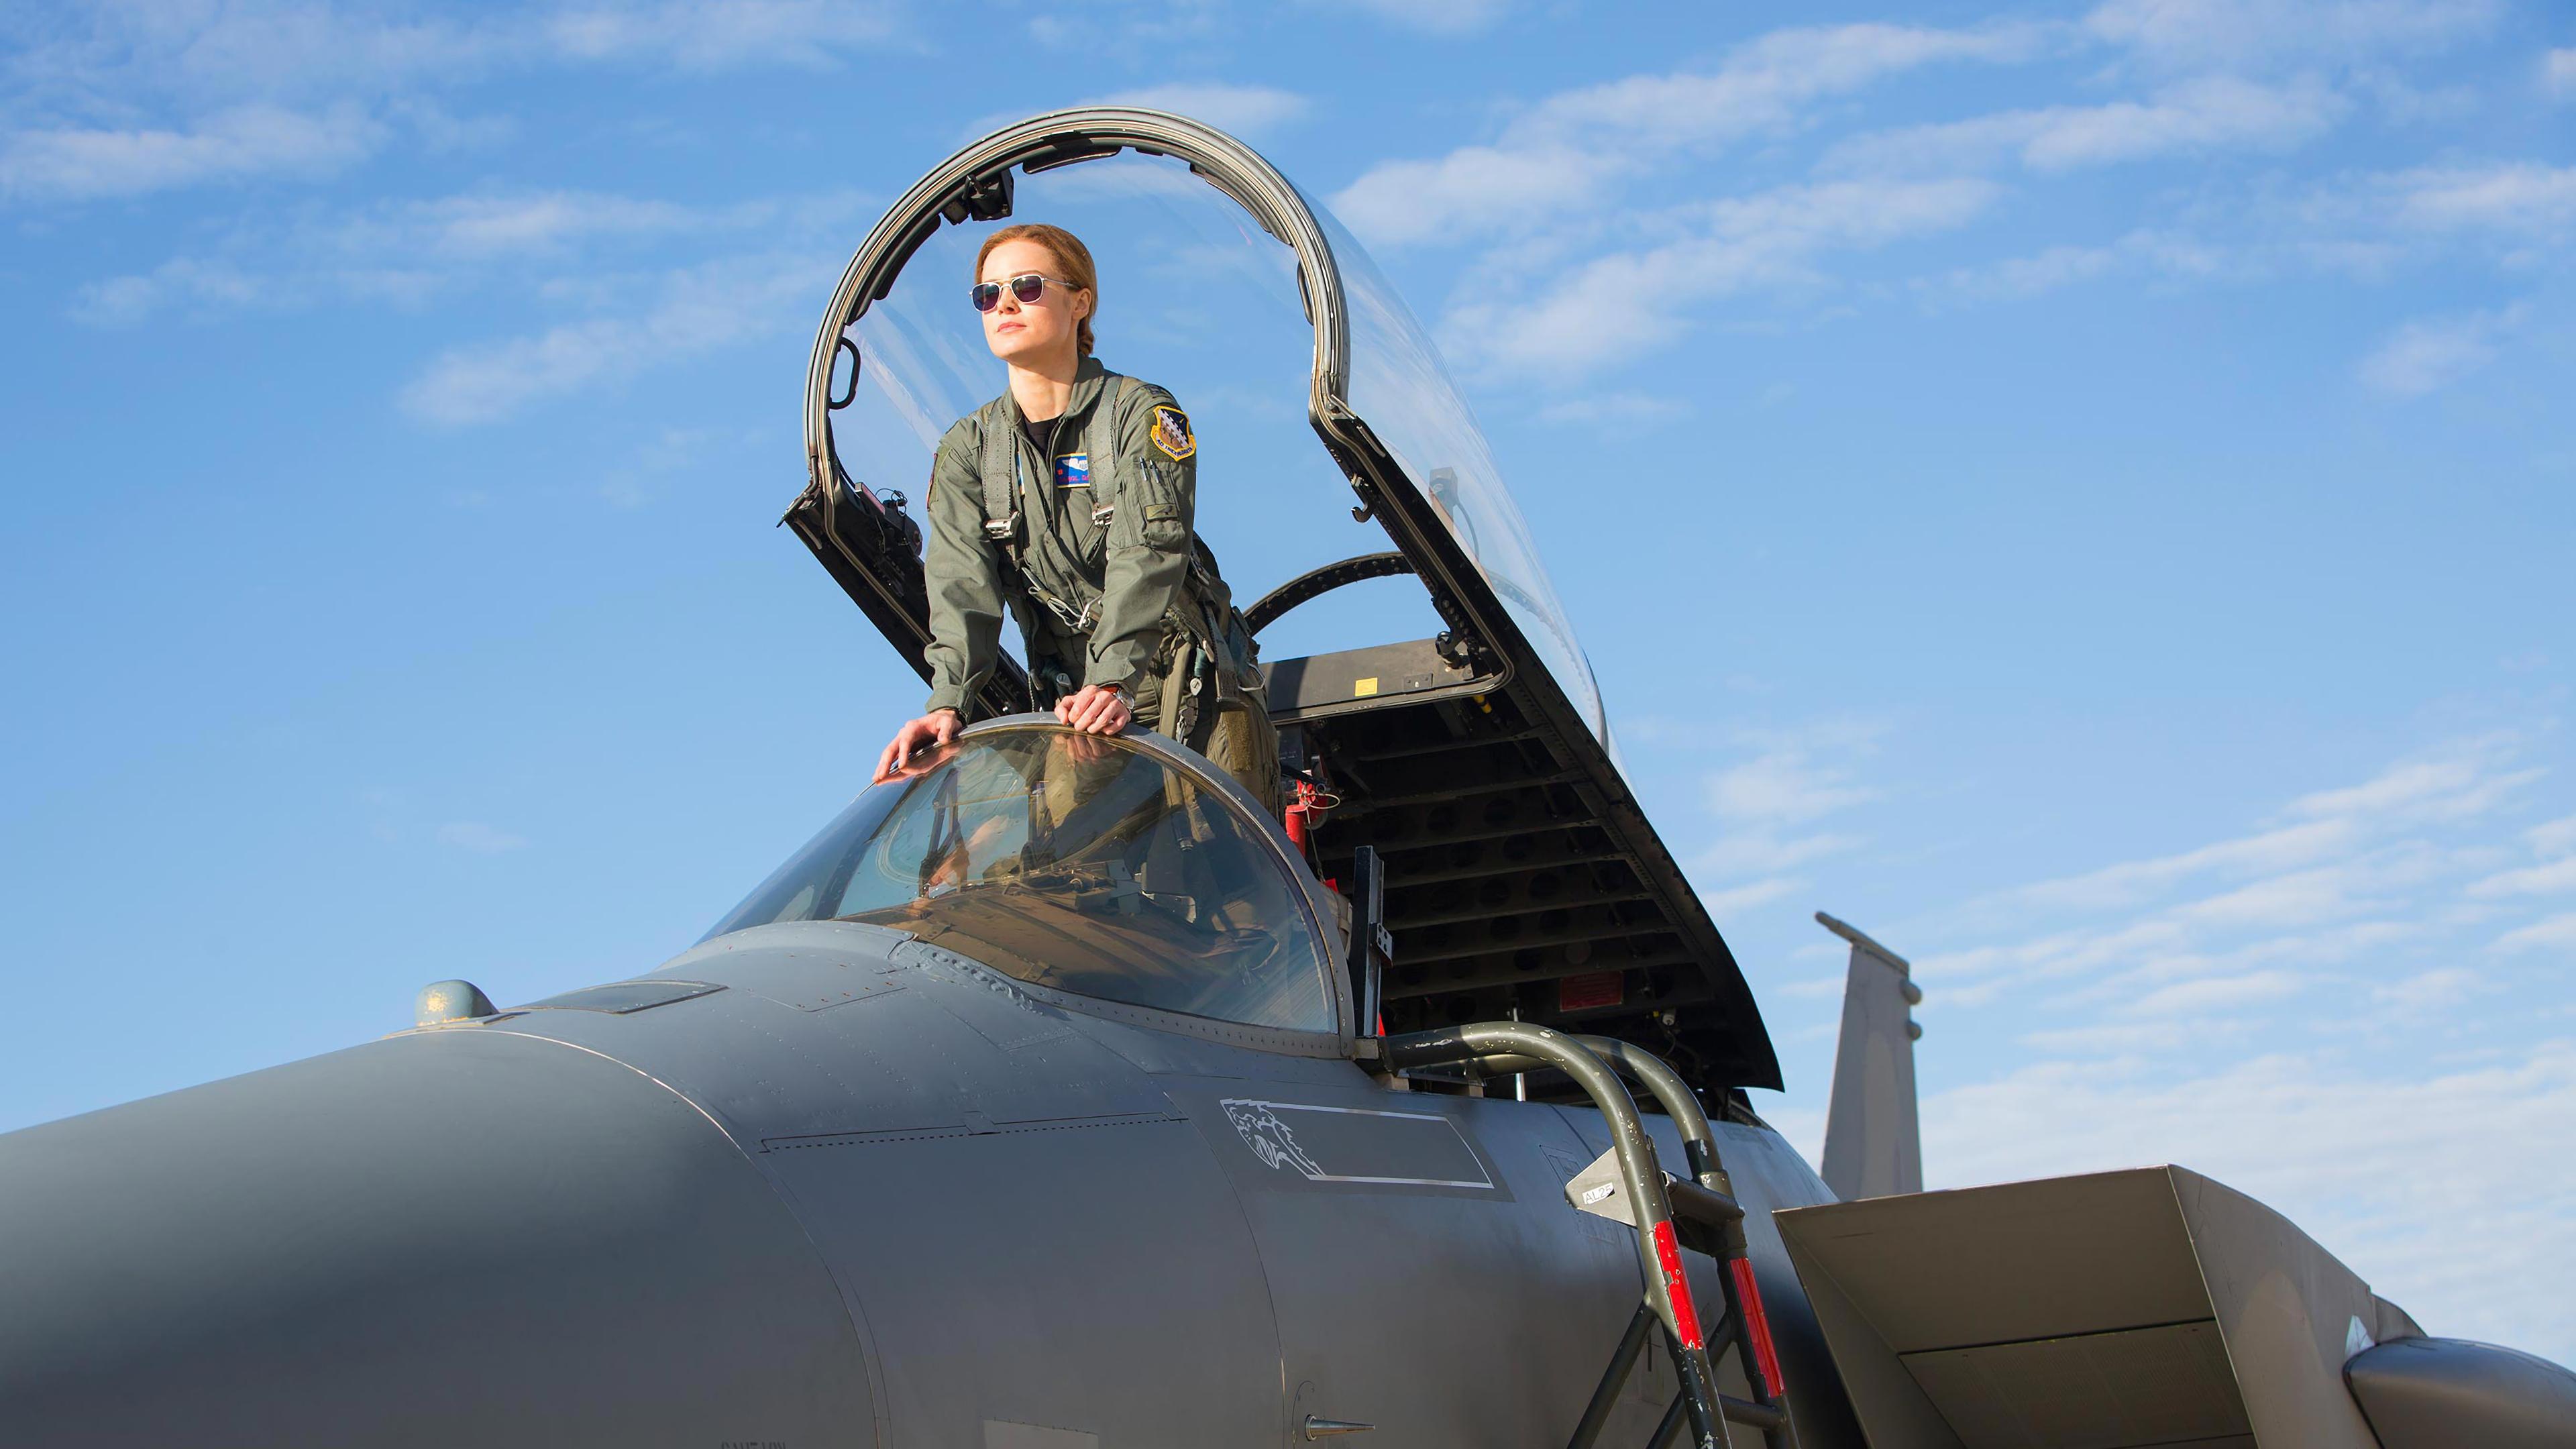 captain marvel movie 2019 brie larson as carol danvers 4k wallpaper 1544829320 - Captain Marvel Movie 2019 Brie Larson as Carol Danvers 4K Wallpaper - Captain Marvel (Movie 2019), Captain Marvel (Carol Danvers)